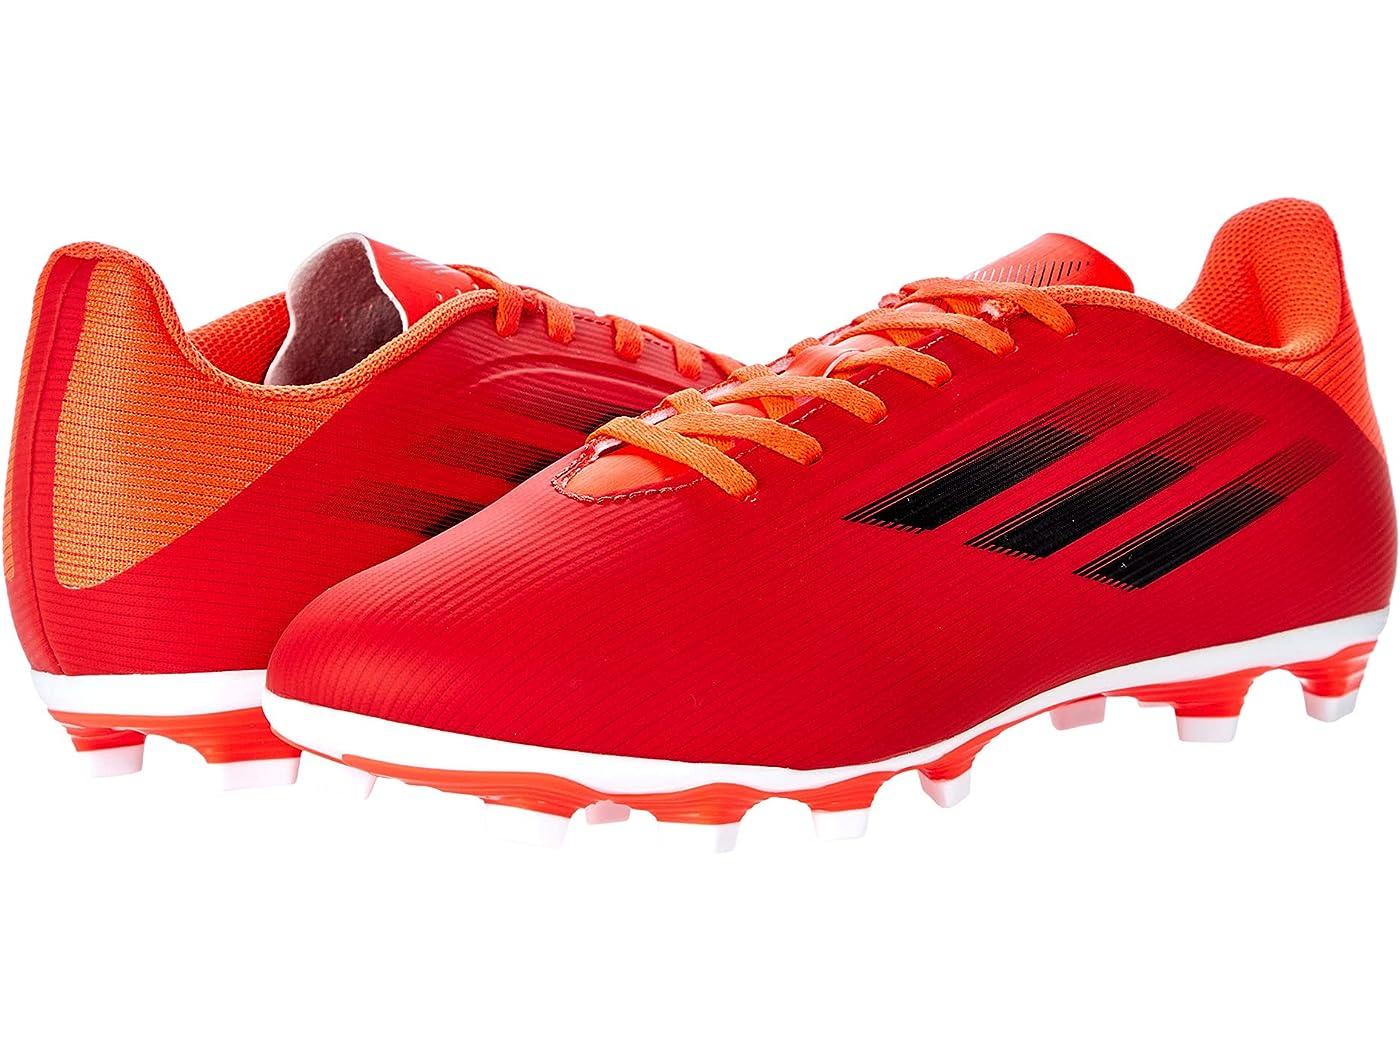 Adidas X Speedflow4 Firm Ground Soccer Cleats